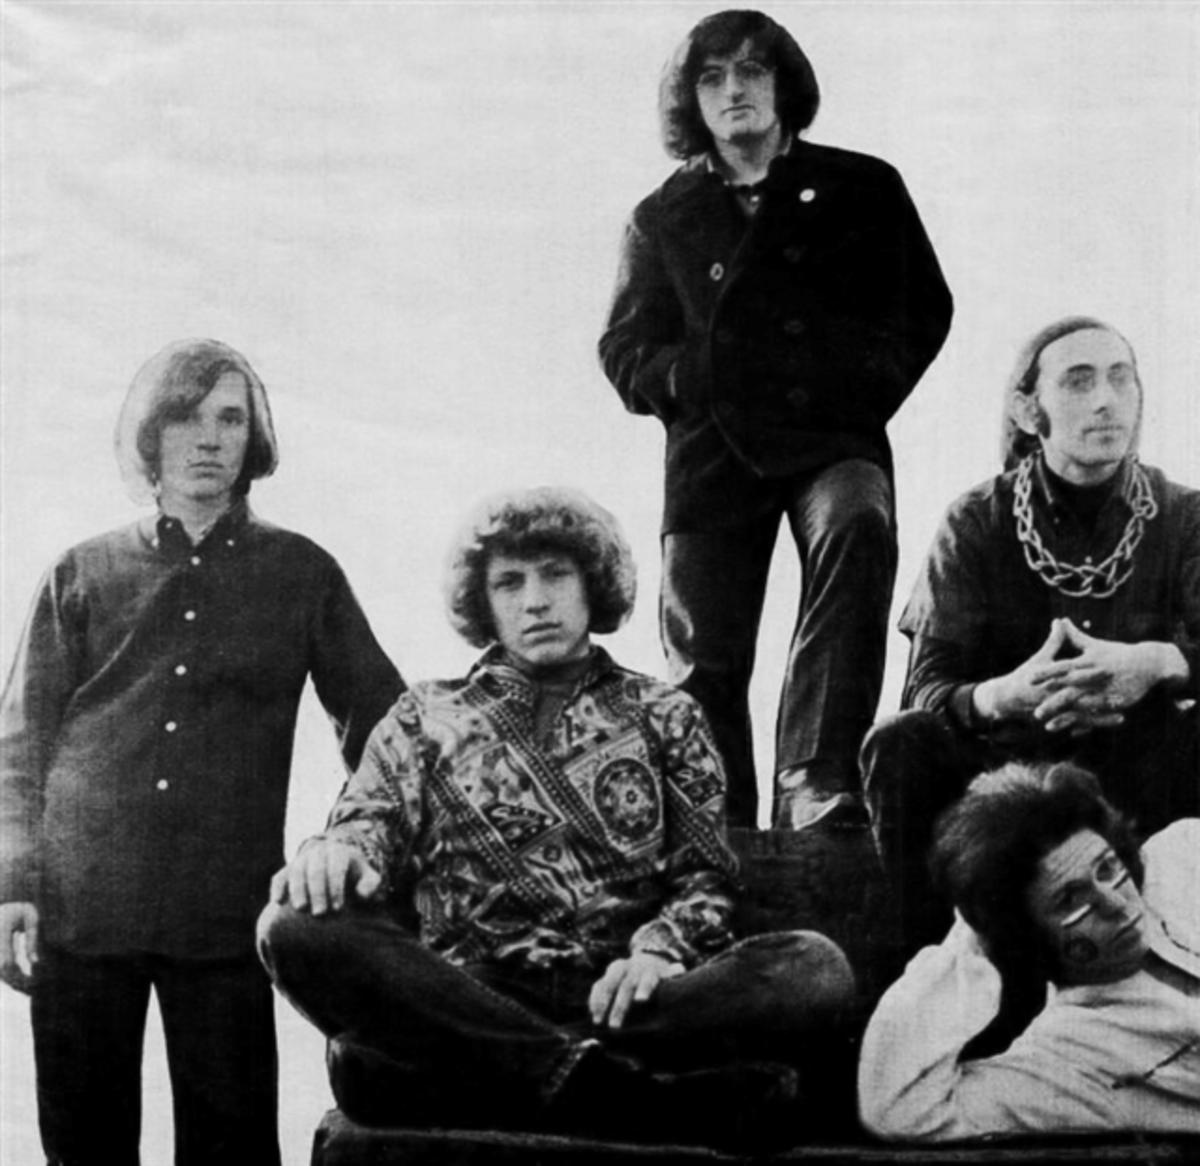 Woodstock Performers: Country Joe & The Fish